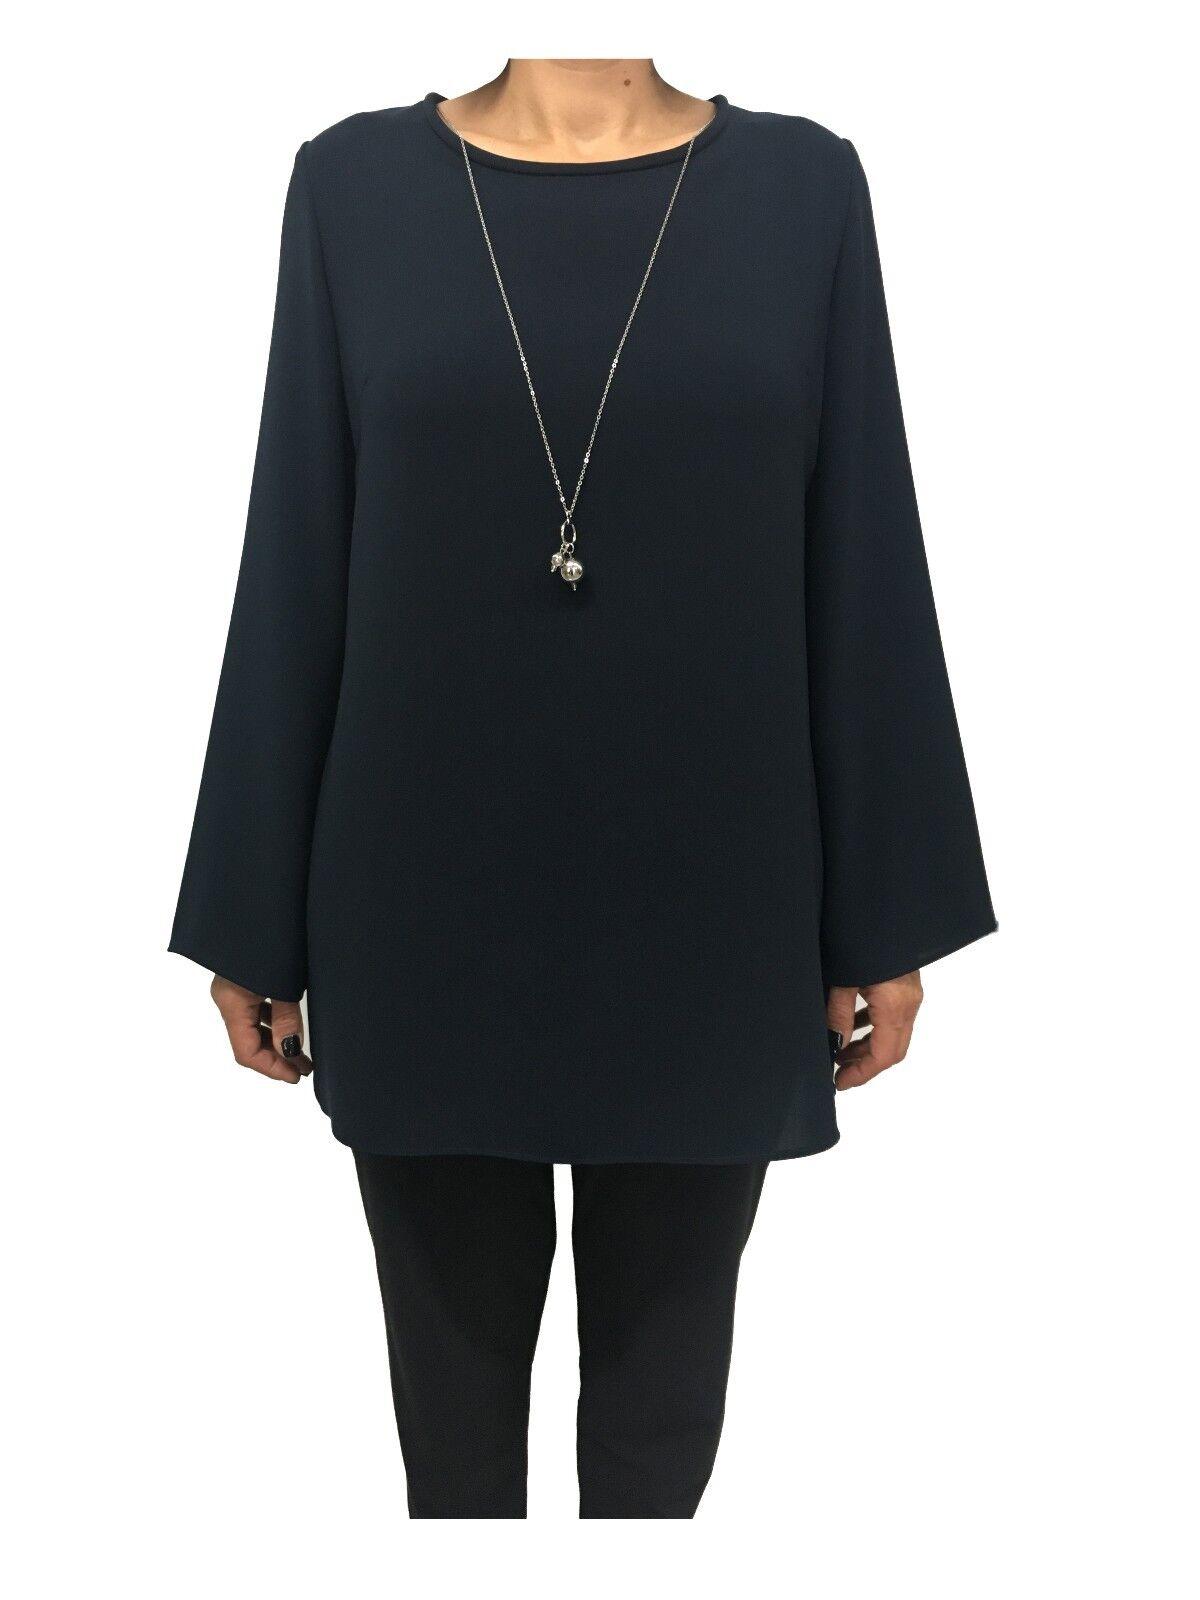 ELENA MIRÒ blusa donna blu manica lunga 100% poliestere + collana